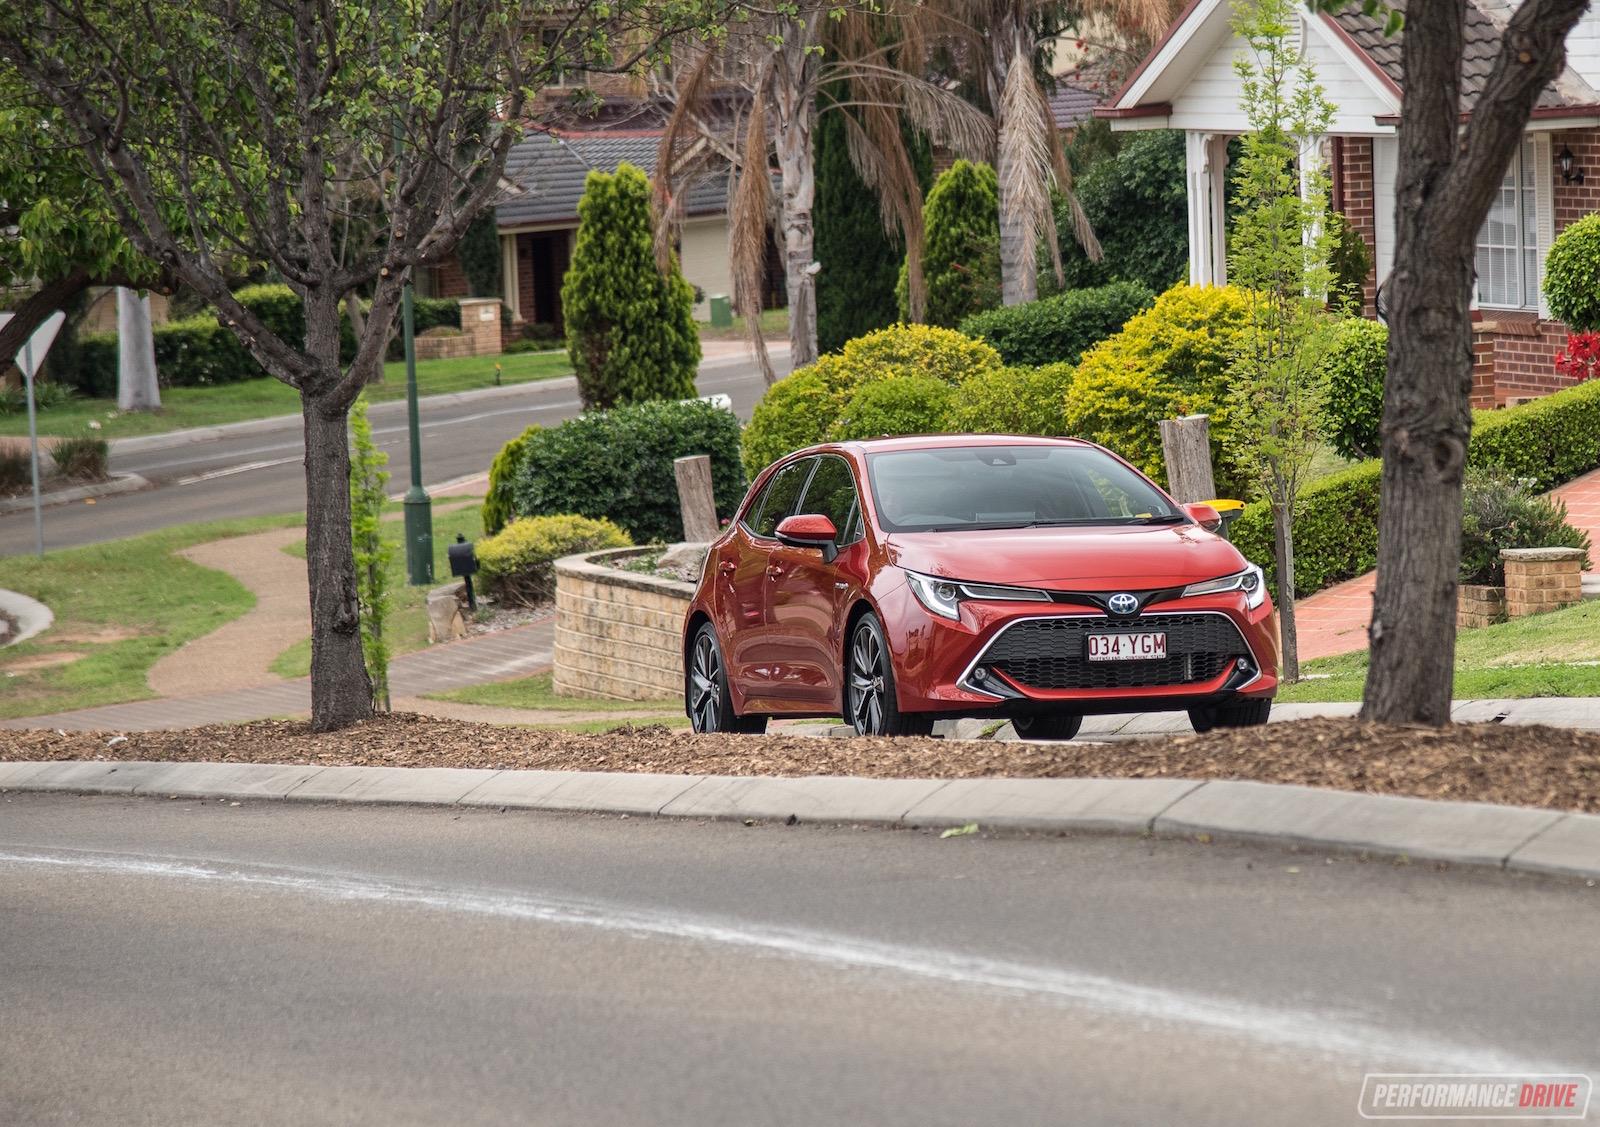 2019 Toyota Corolla Zr Hybrid Review Video Performancedrive